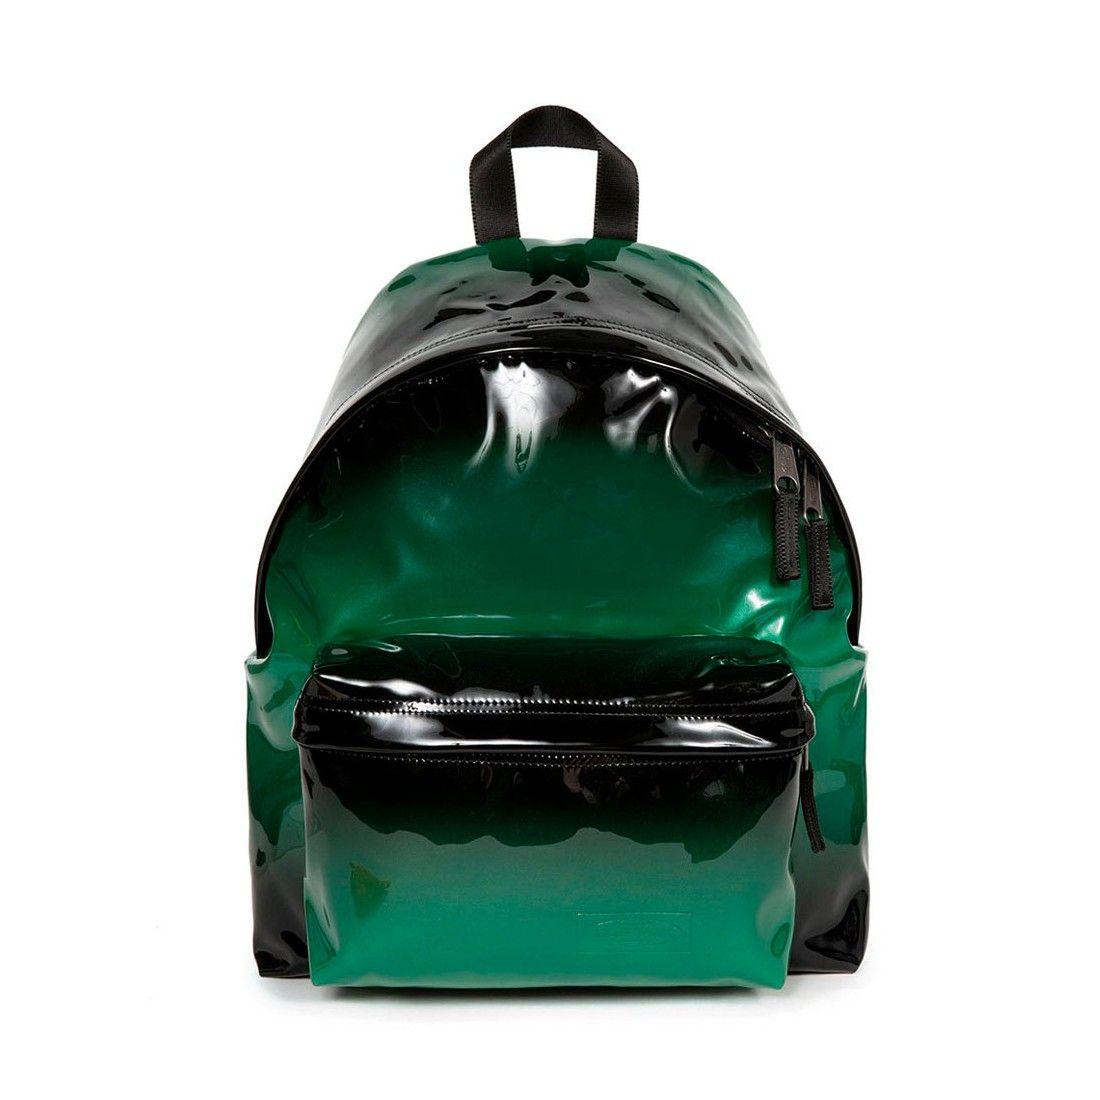 Mochila Padded Pak'R Glossy Green - Eastpak - 1